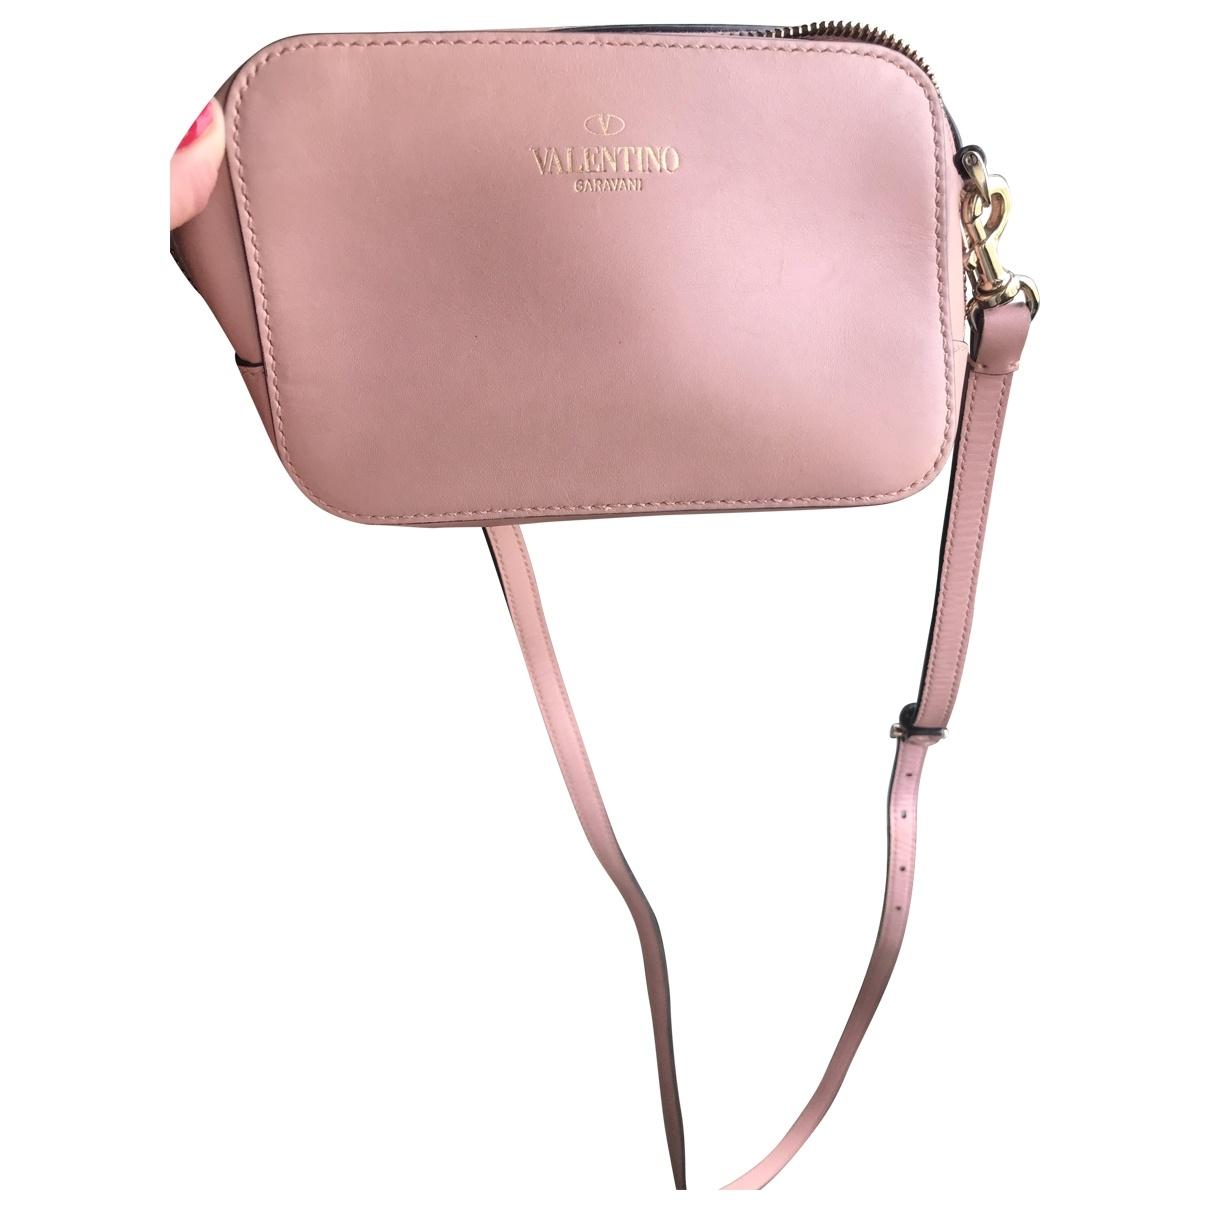 Valentino Garavani \N Pink Leather Clutch bag for Women \N